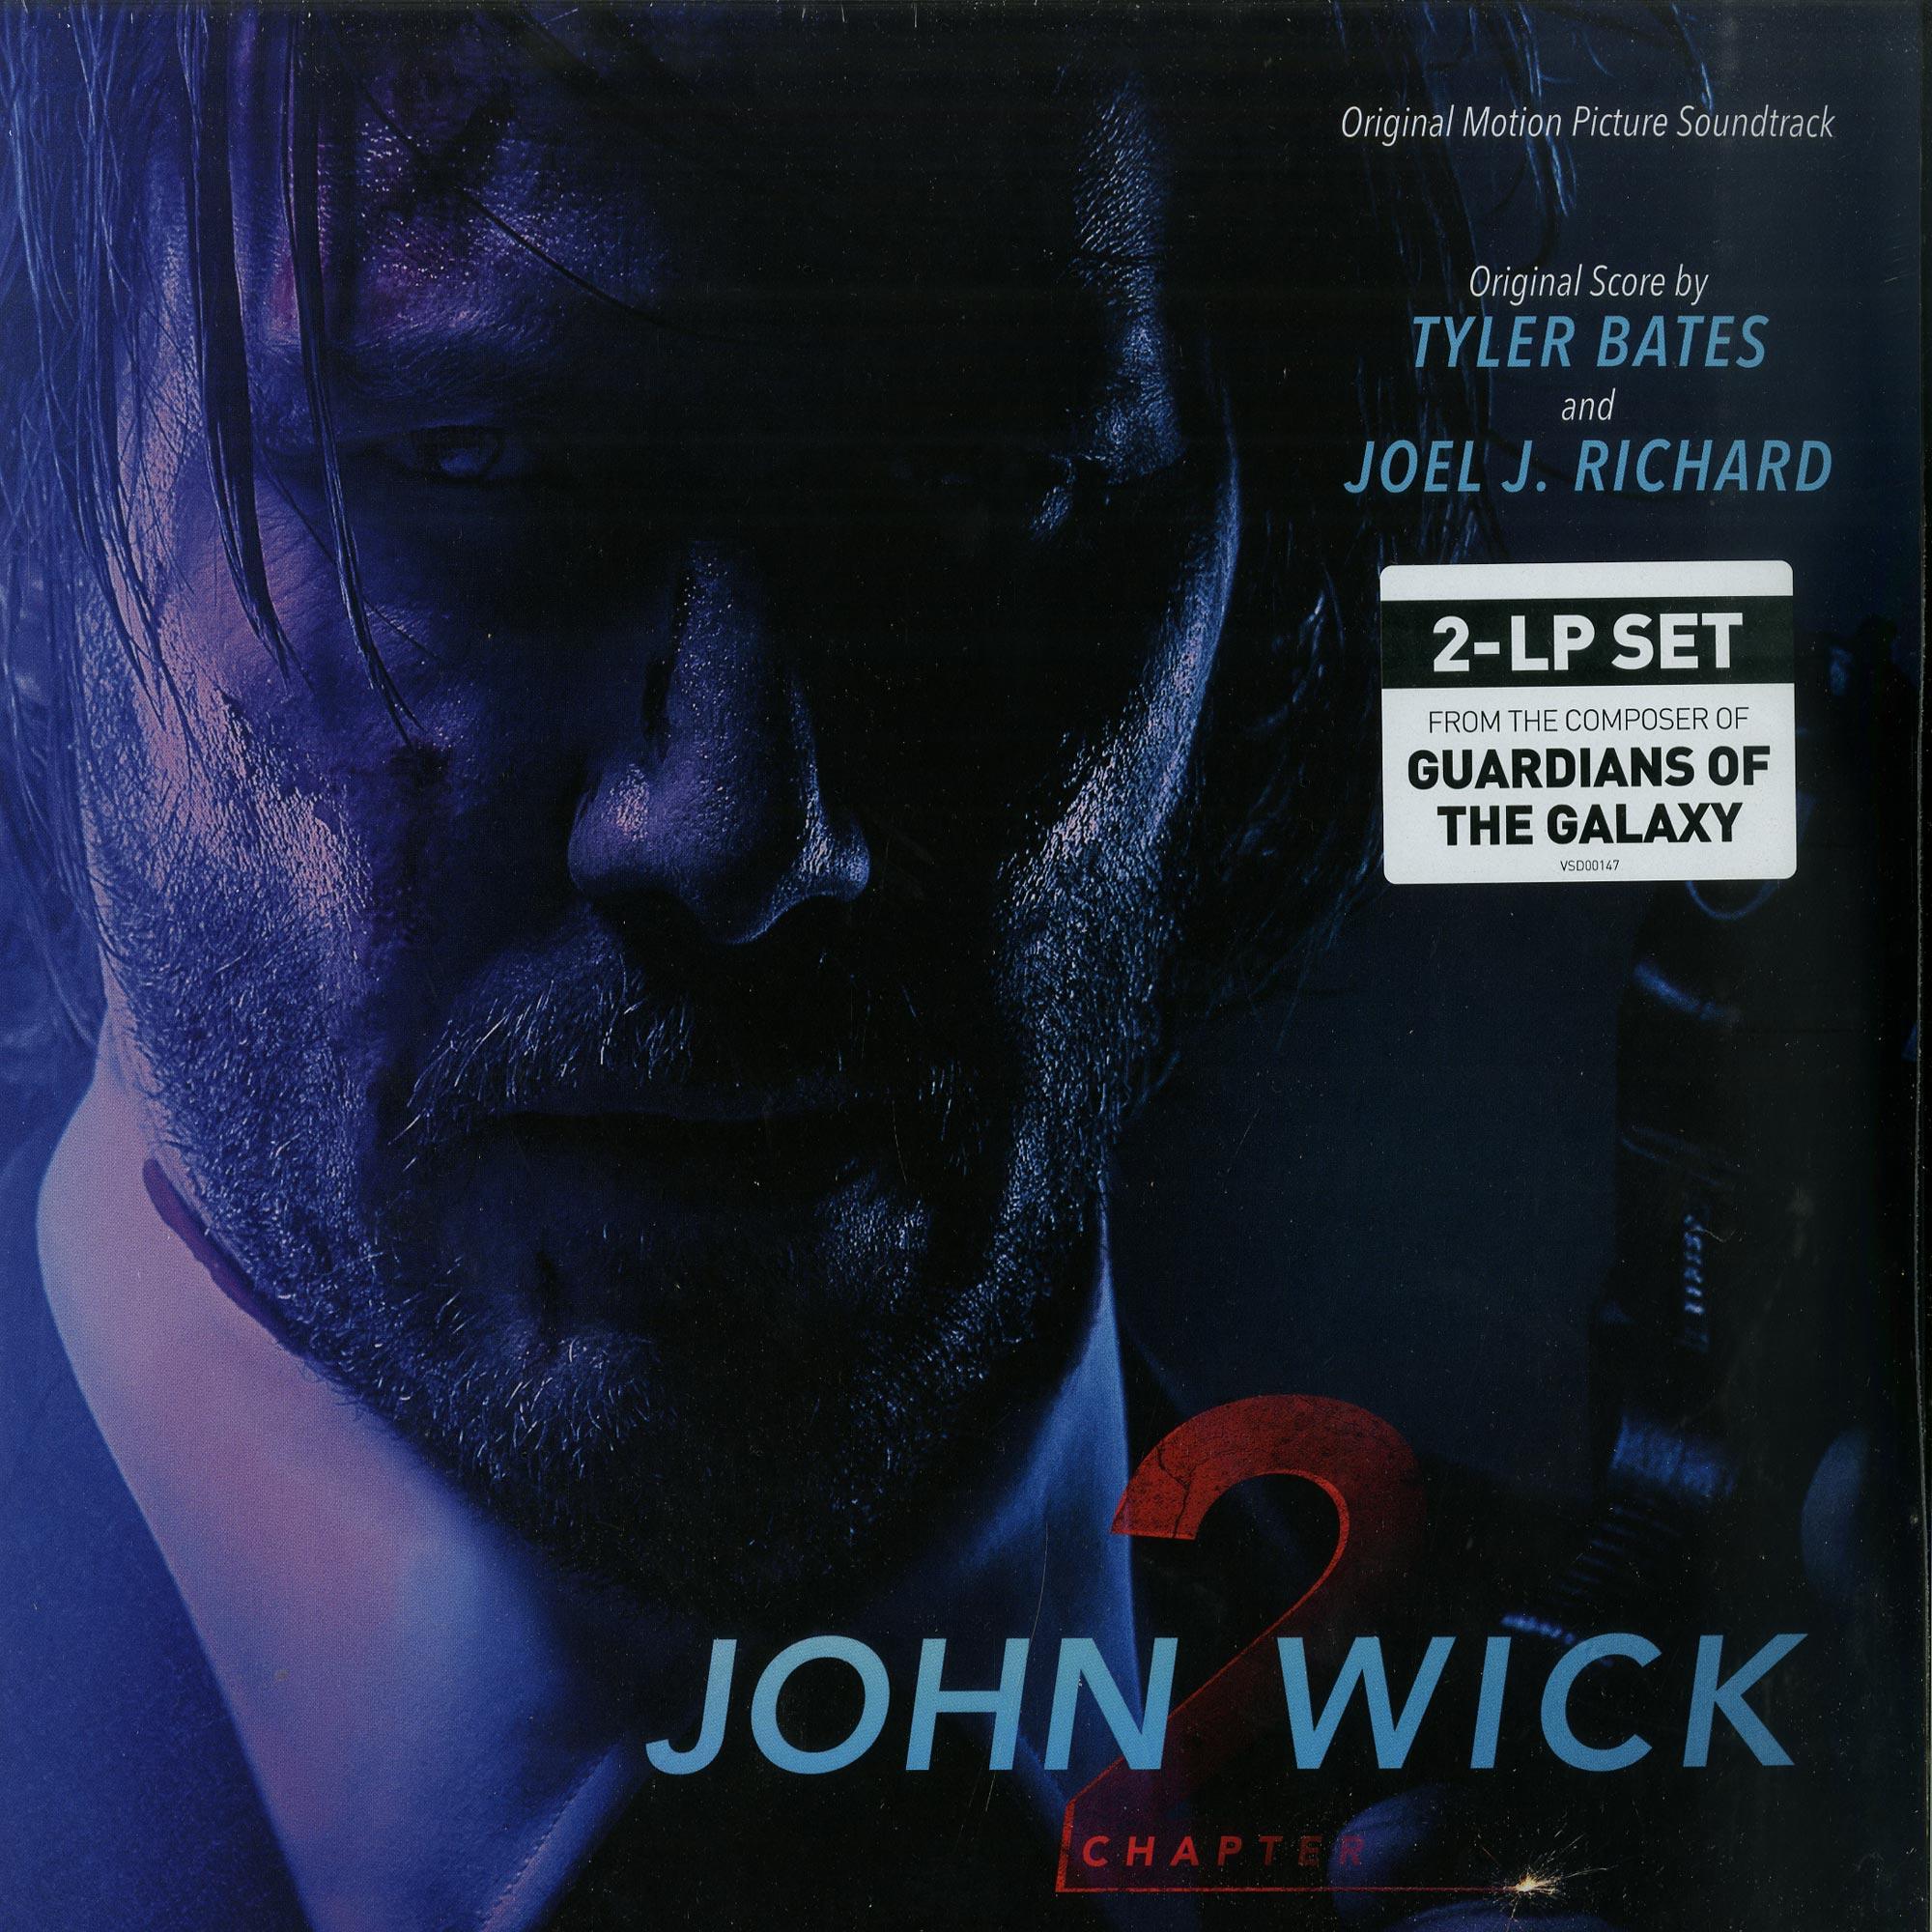 Tyler Bates & Joel J. Richard - JOHN WICK: CHAPTER 2 O.S.T.